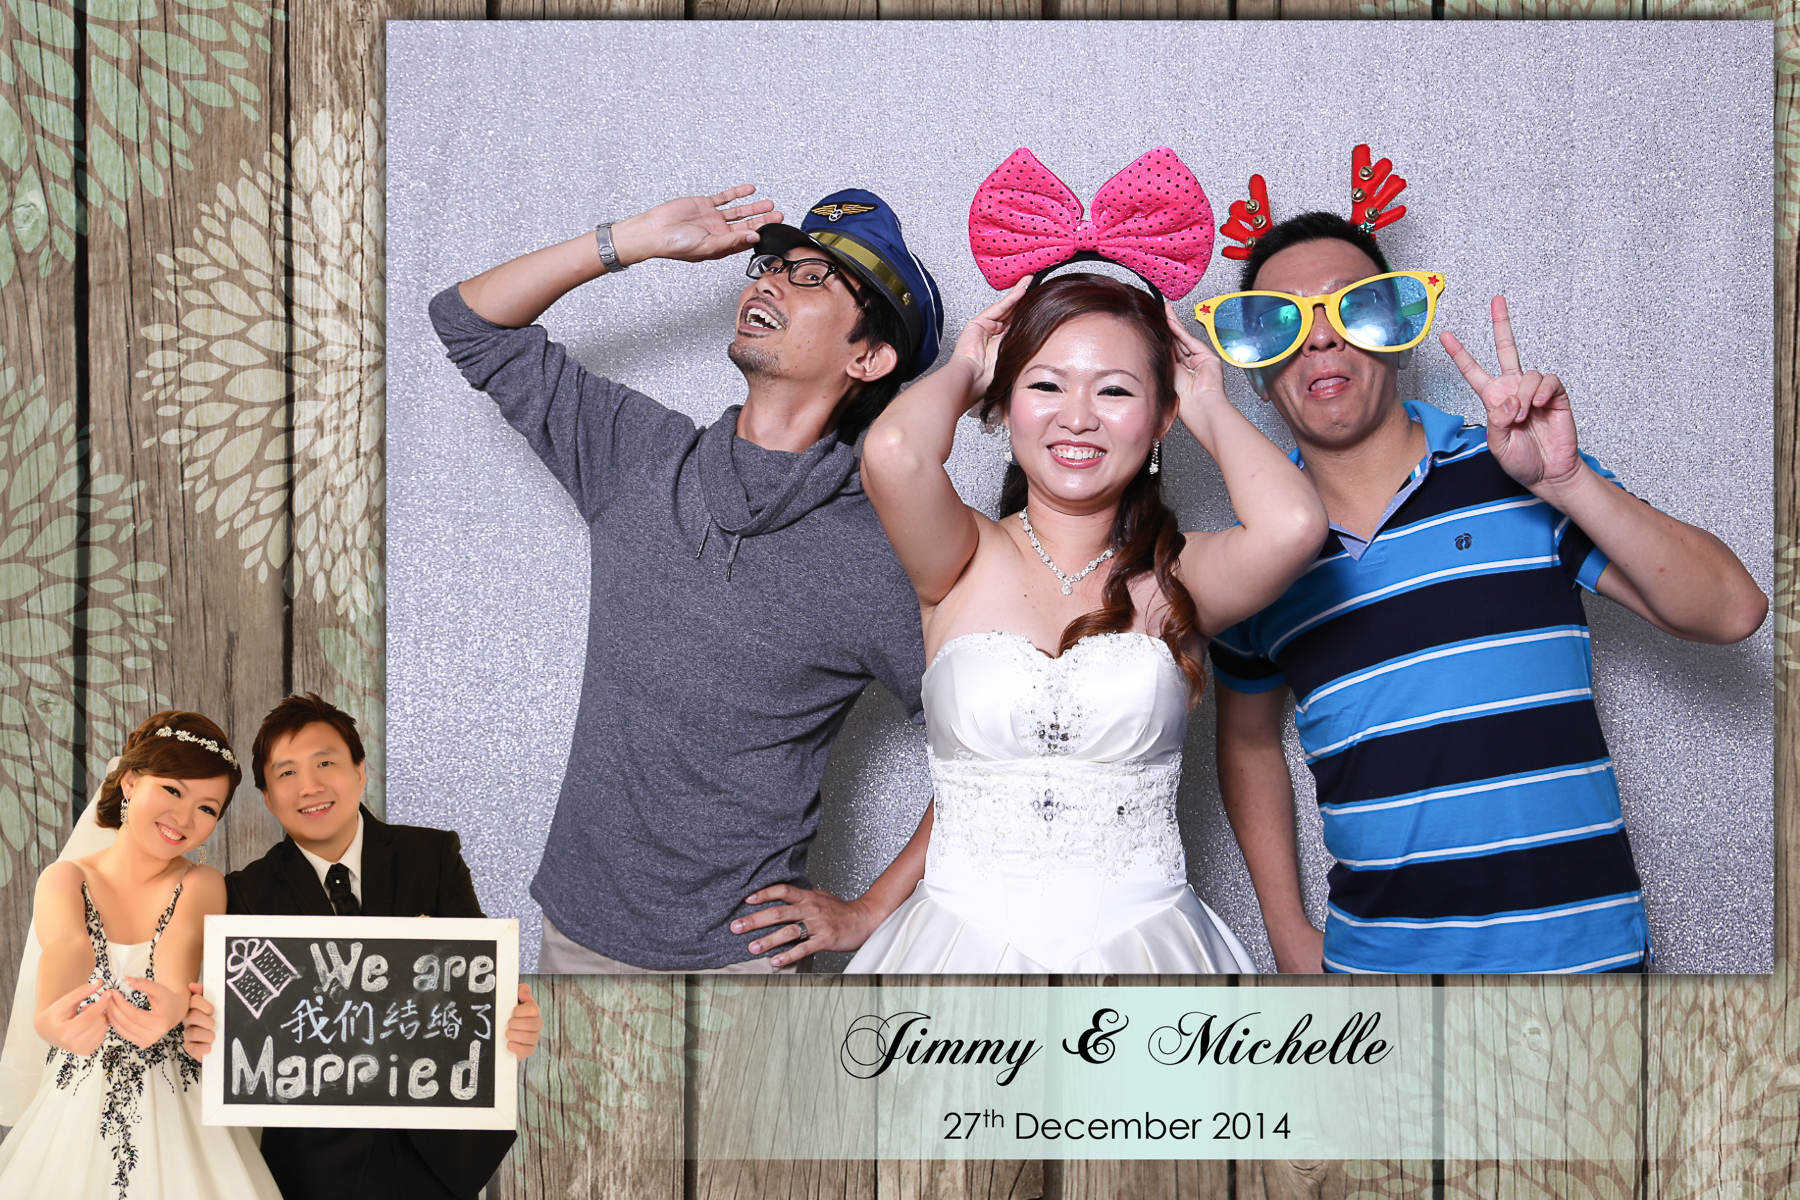 20141227 Jimmy & Michelle